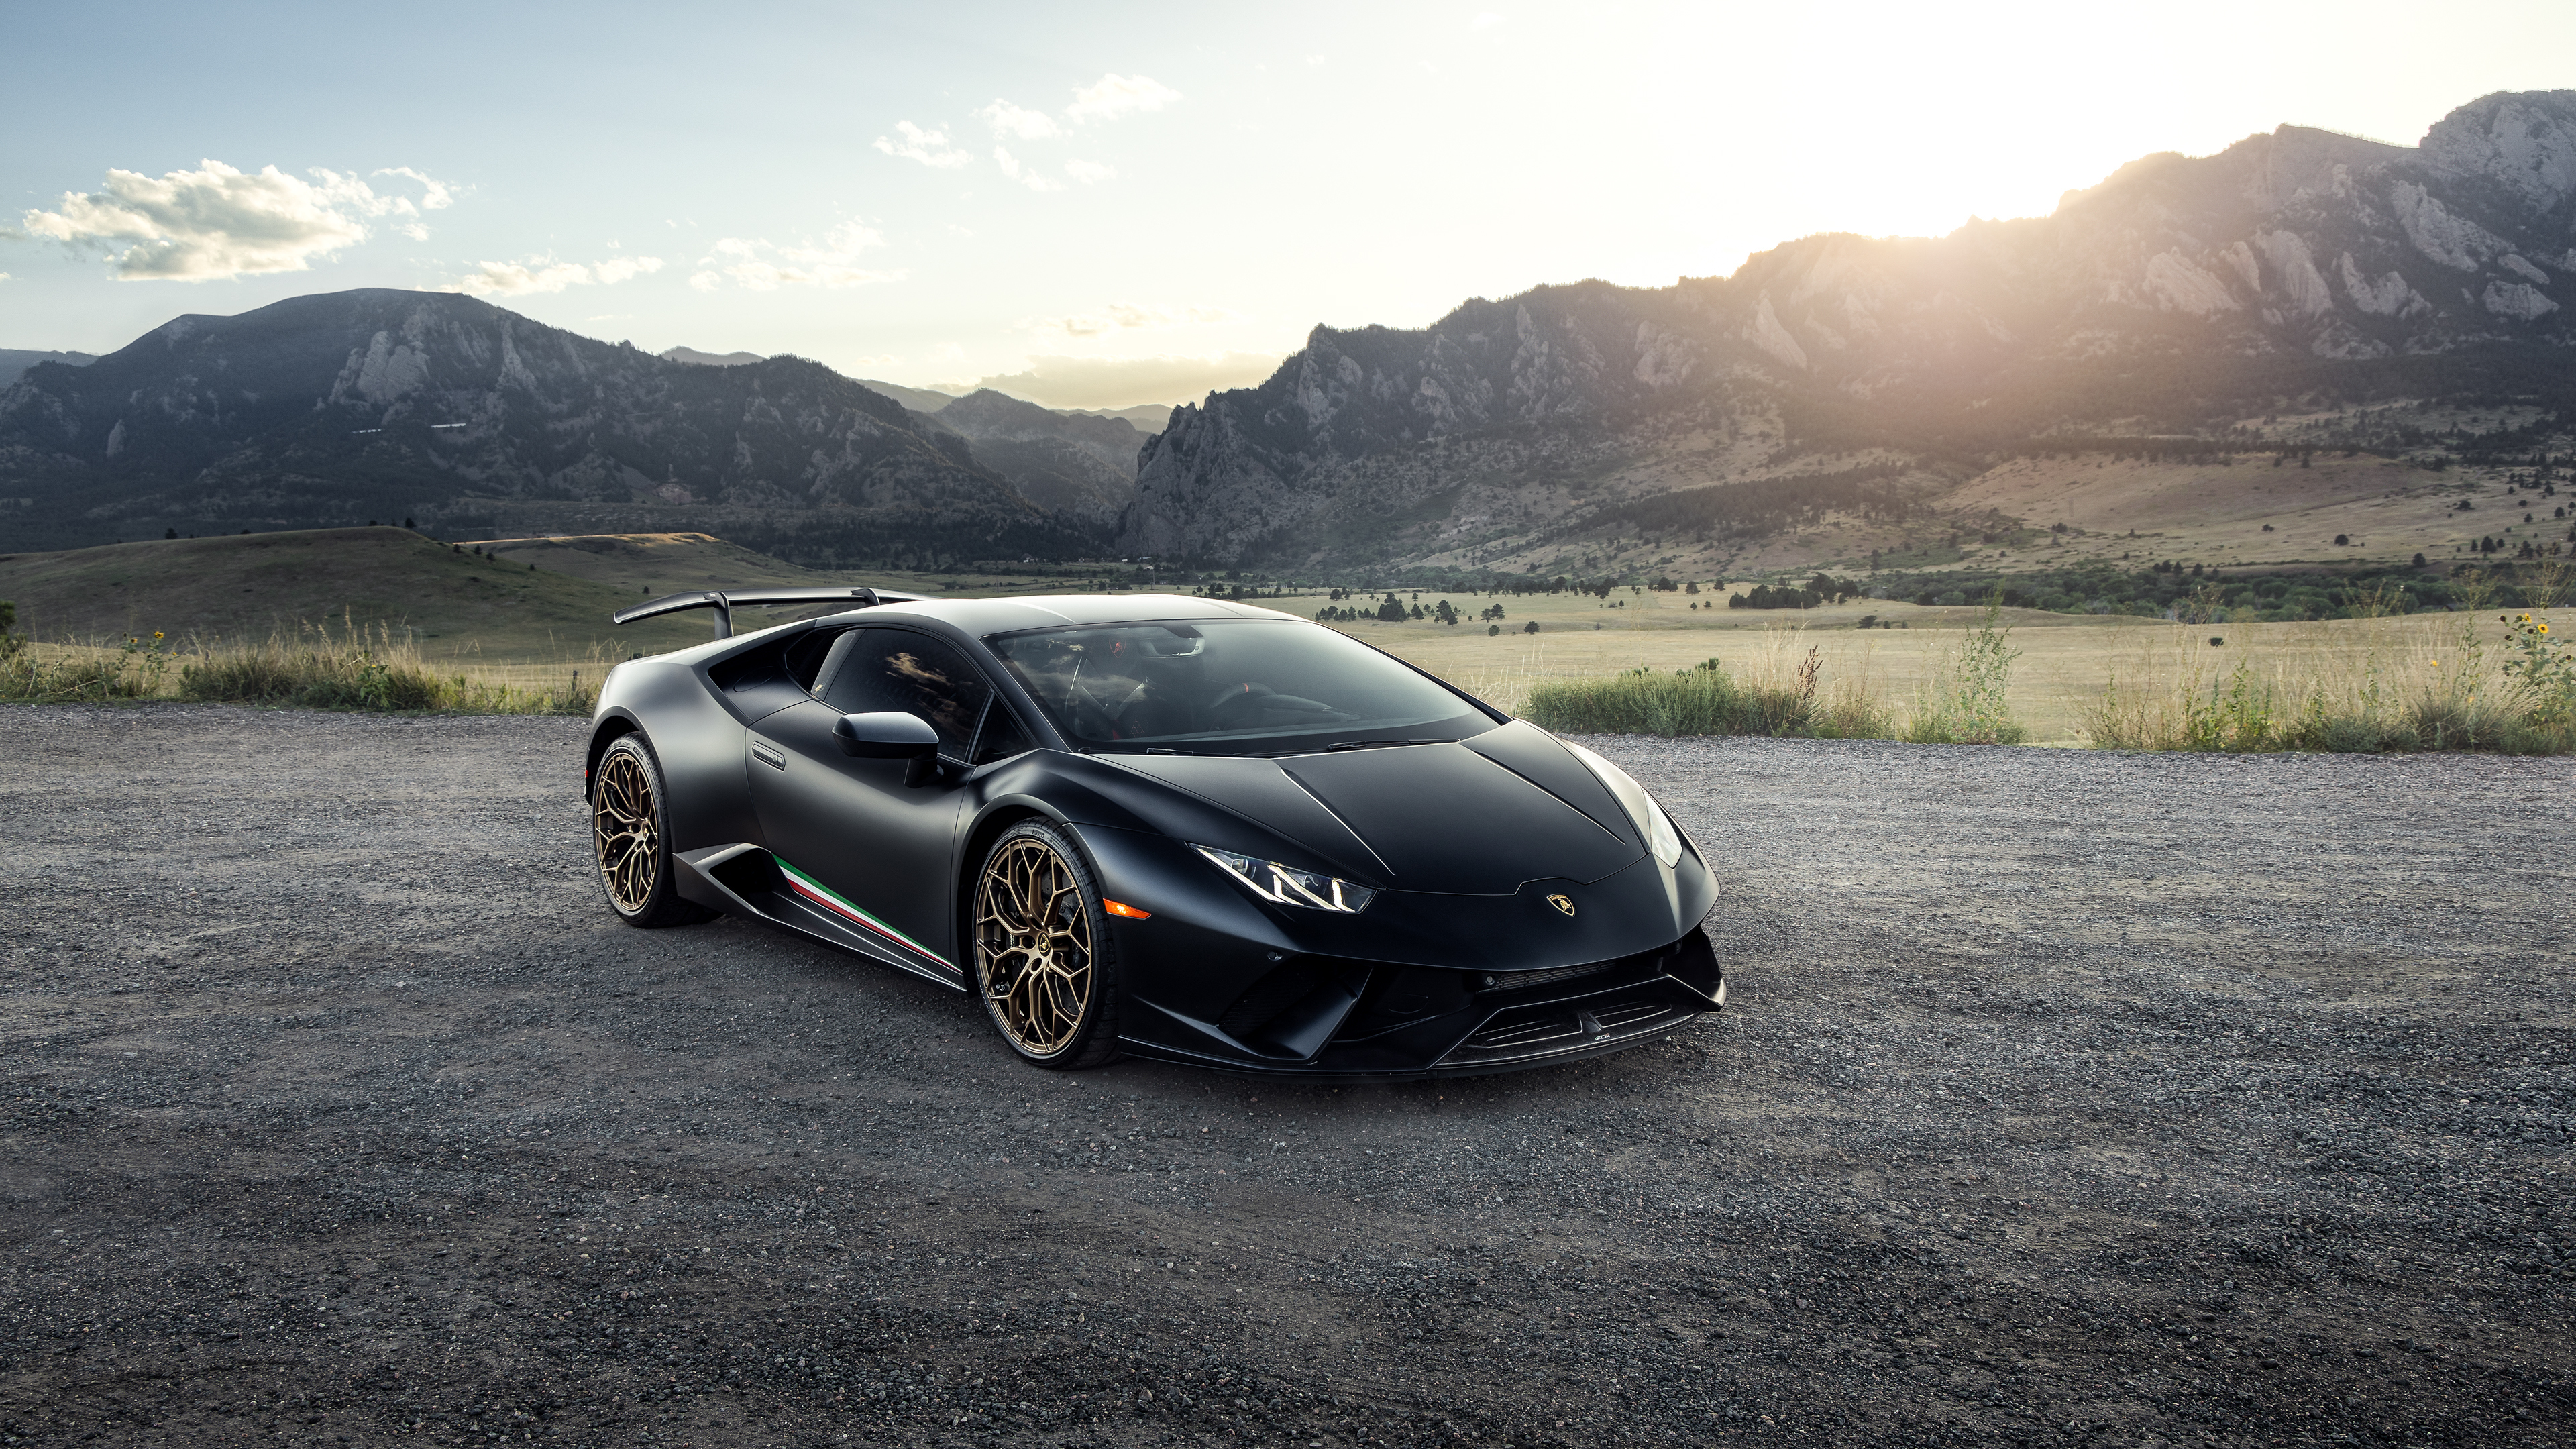 3840x2160 Black Lamborghini Huracan 2020 4k HD 4k ...